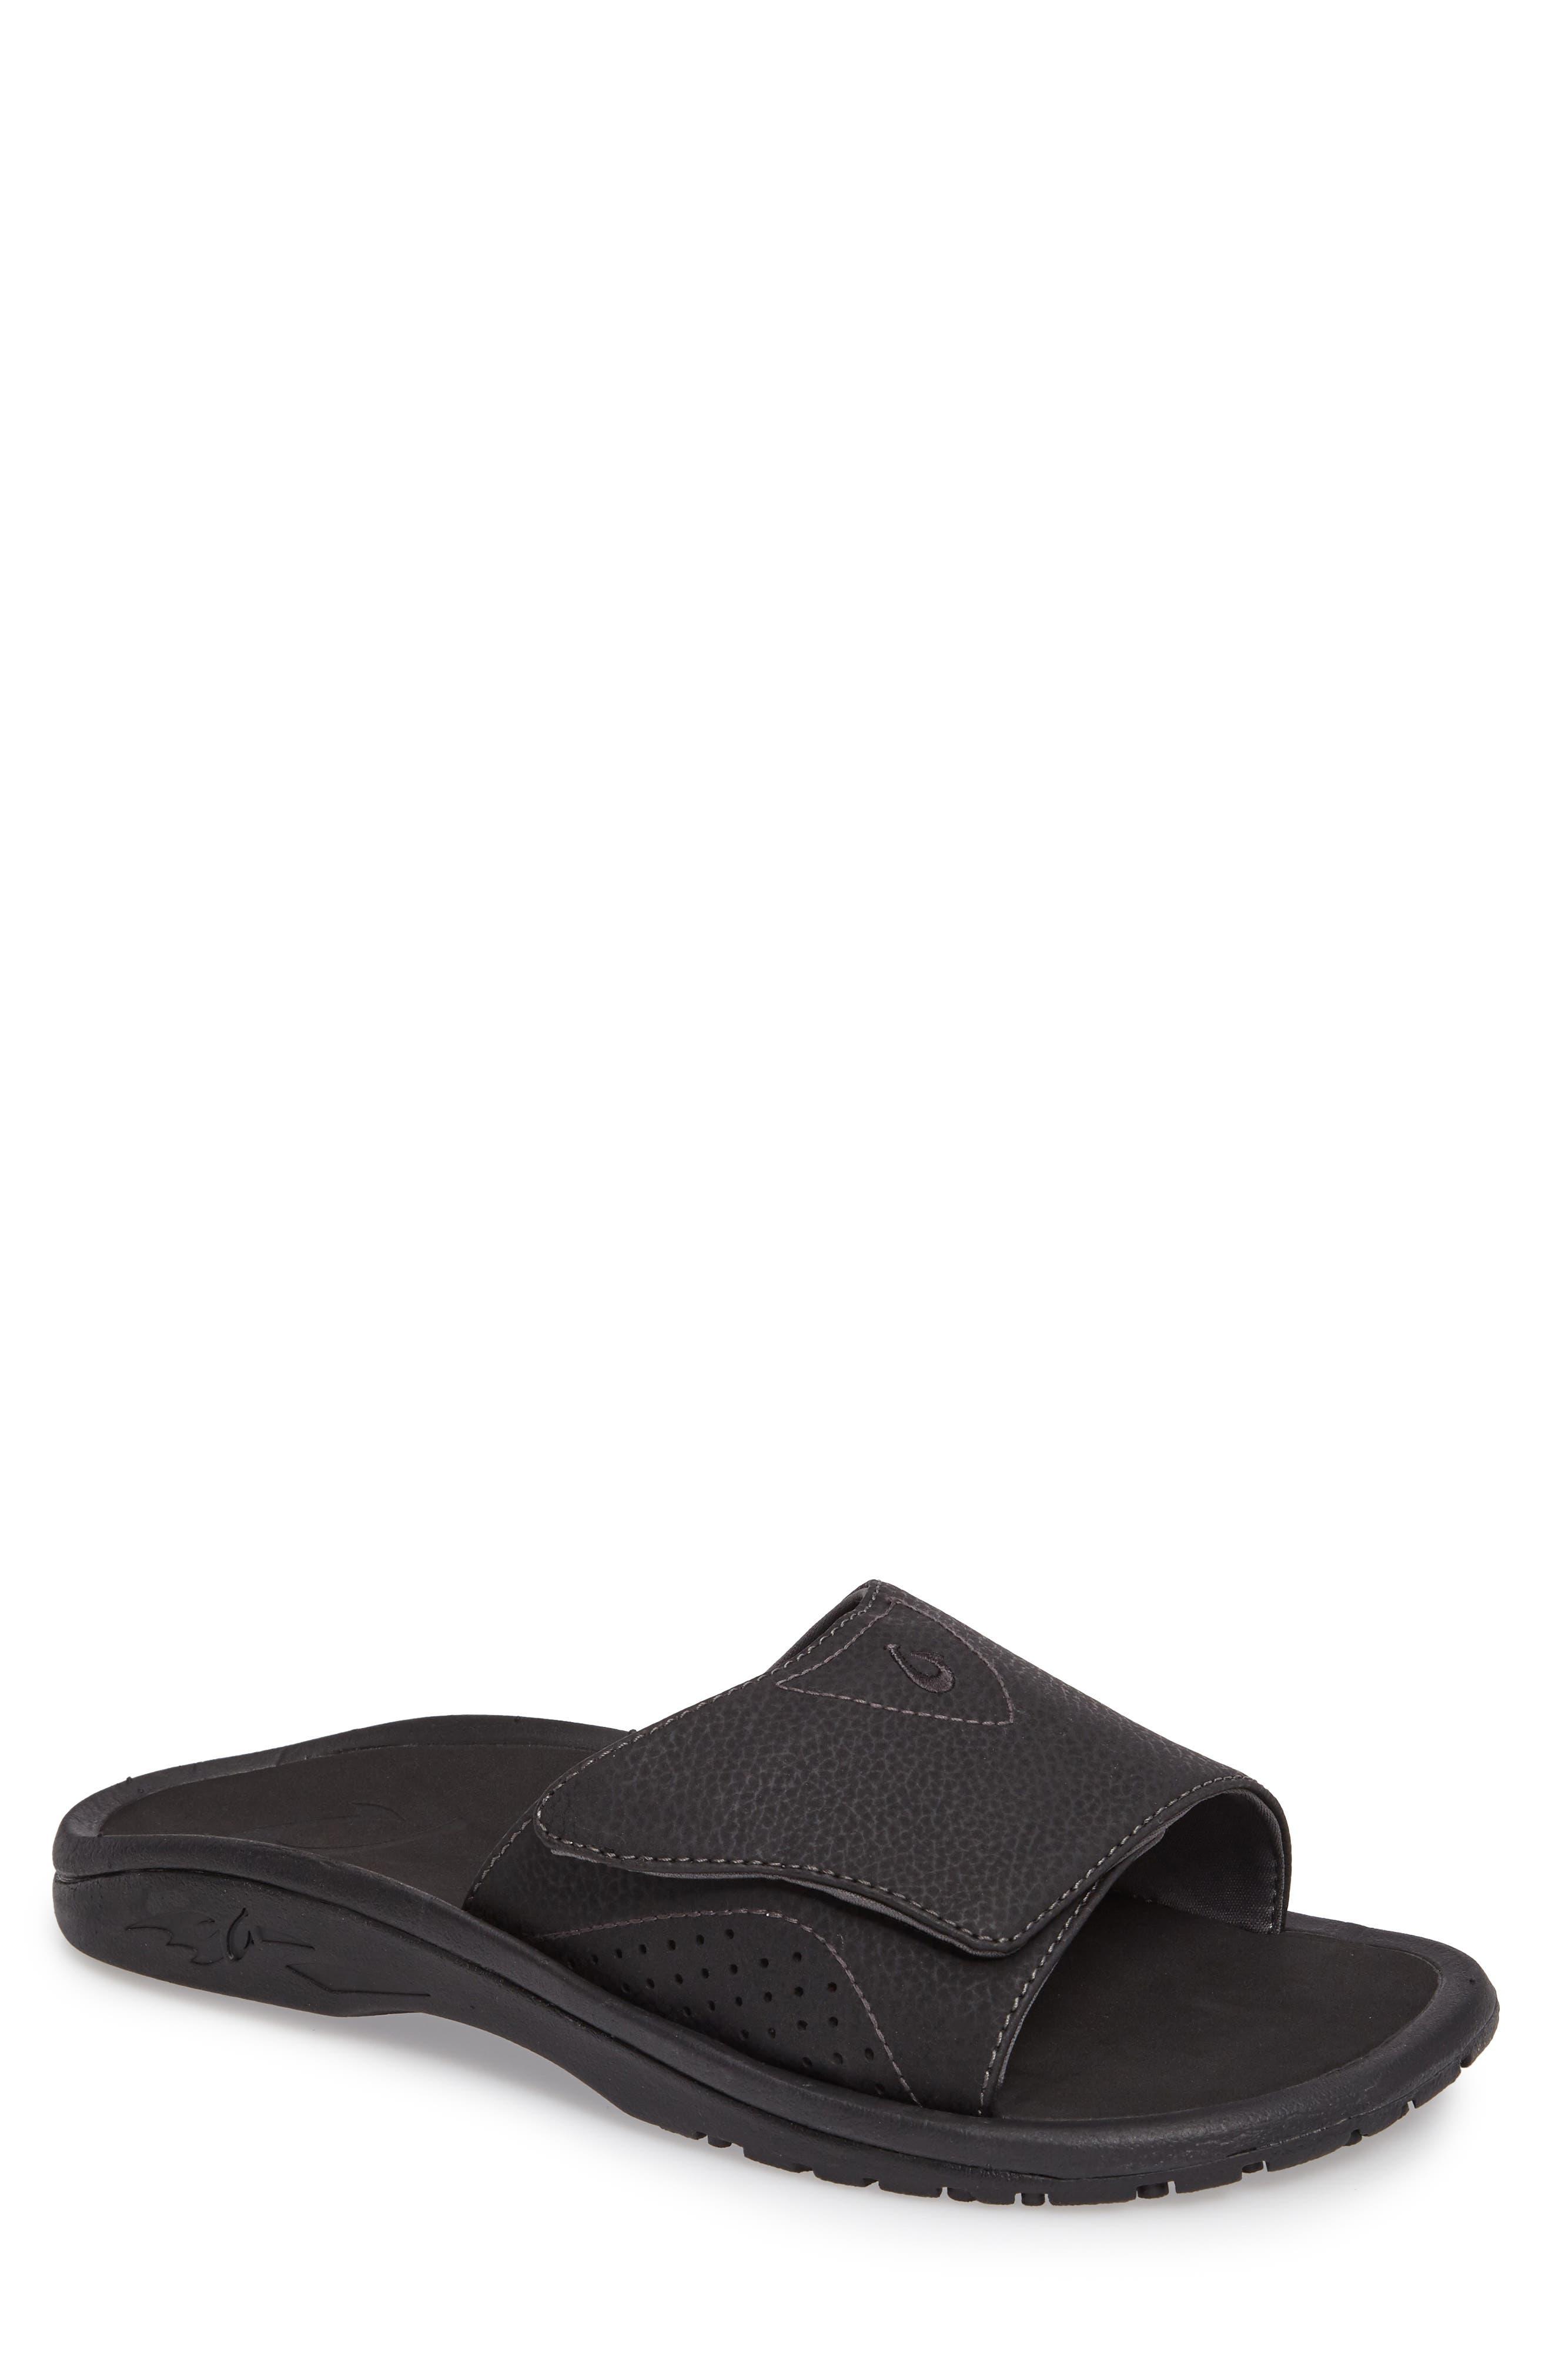 Nalu Slide Sandal,                         Main,                         color, BLACK/ BLACK